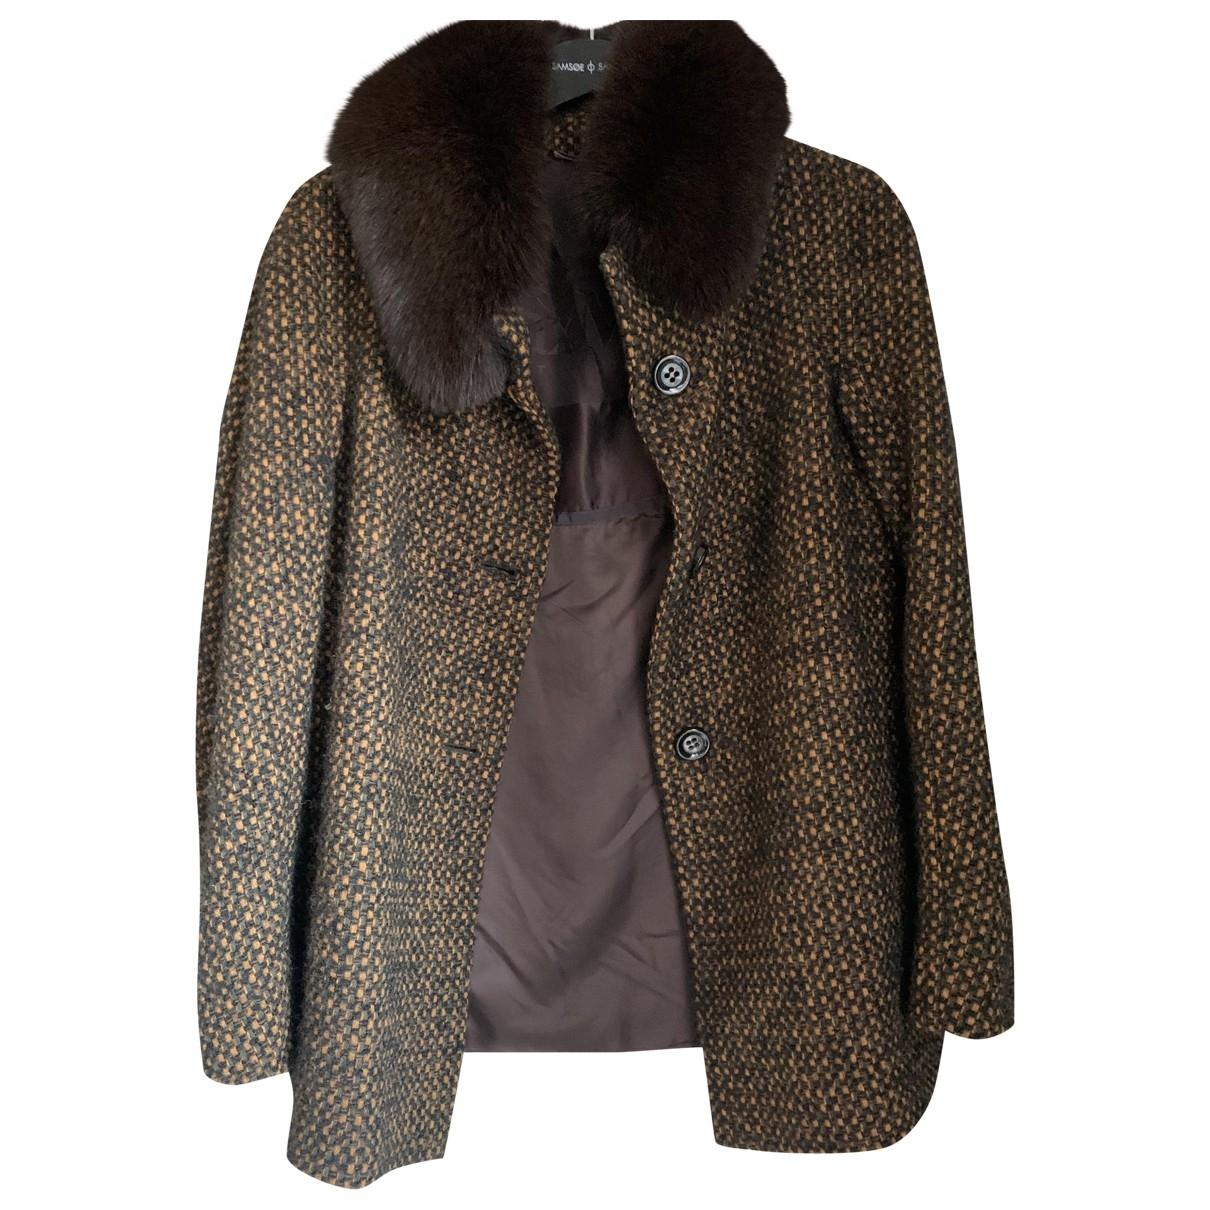 Max Mara \N Maentel in  Braun Wolle